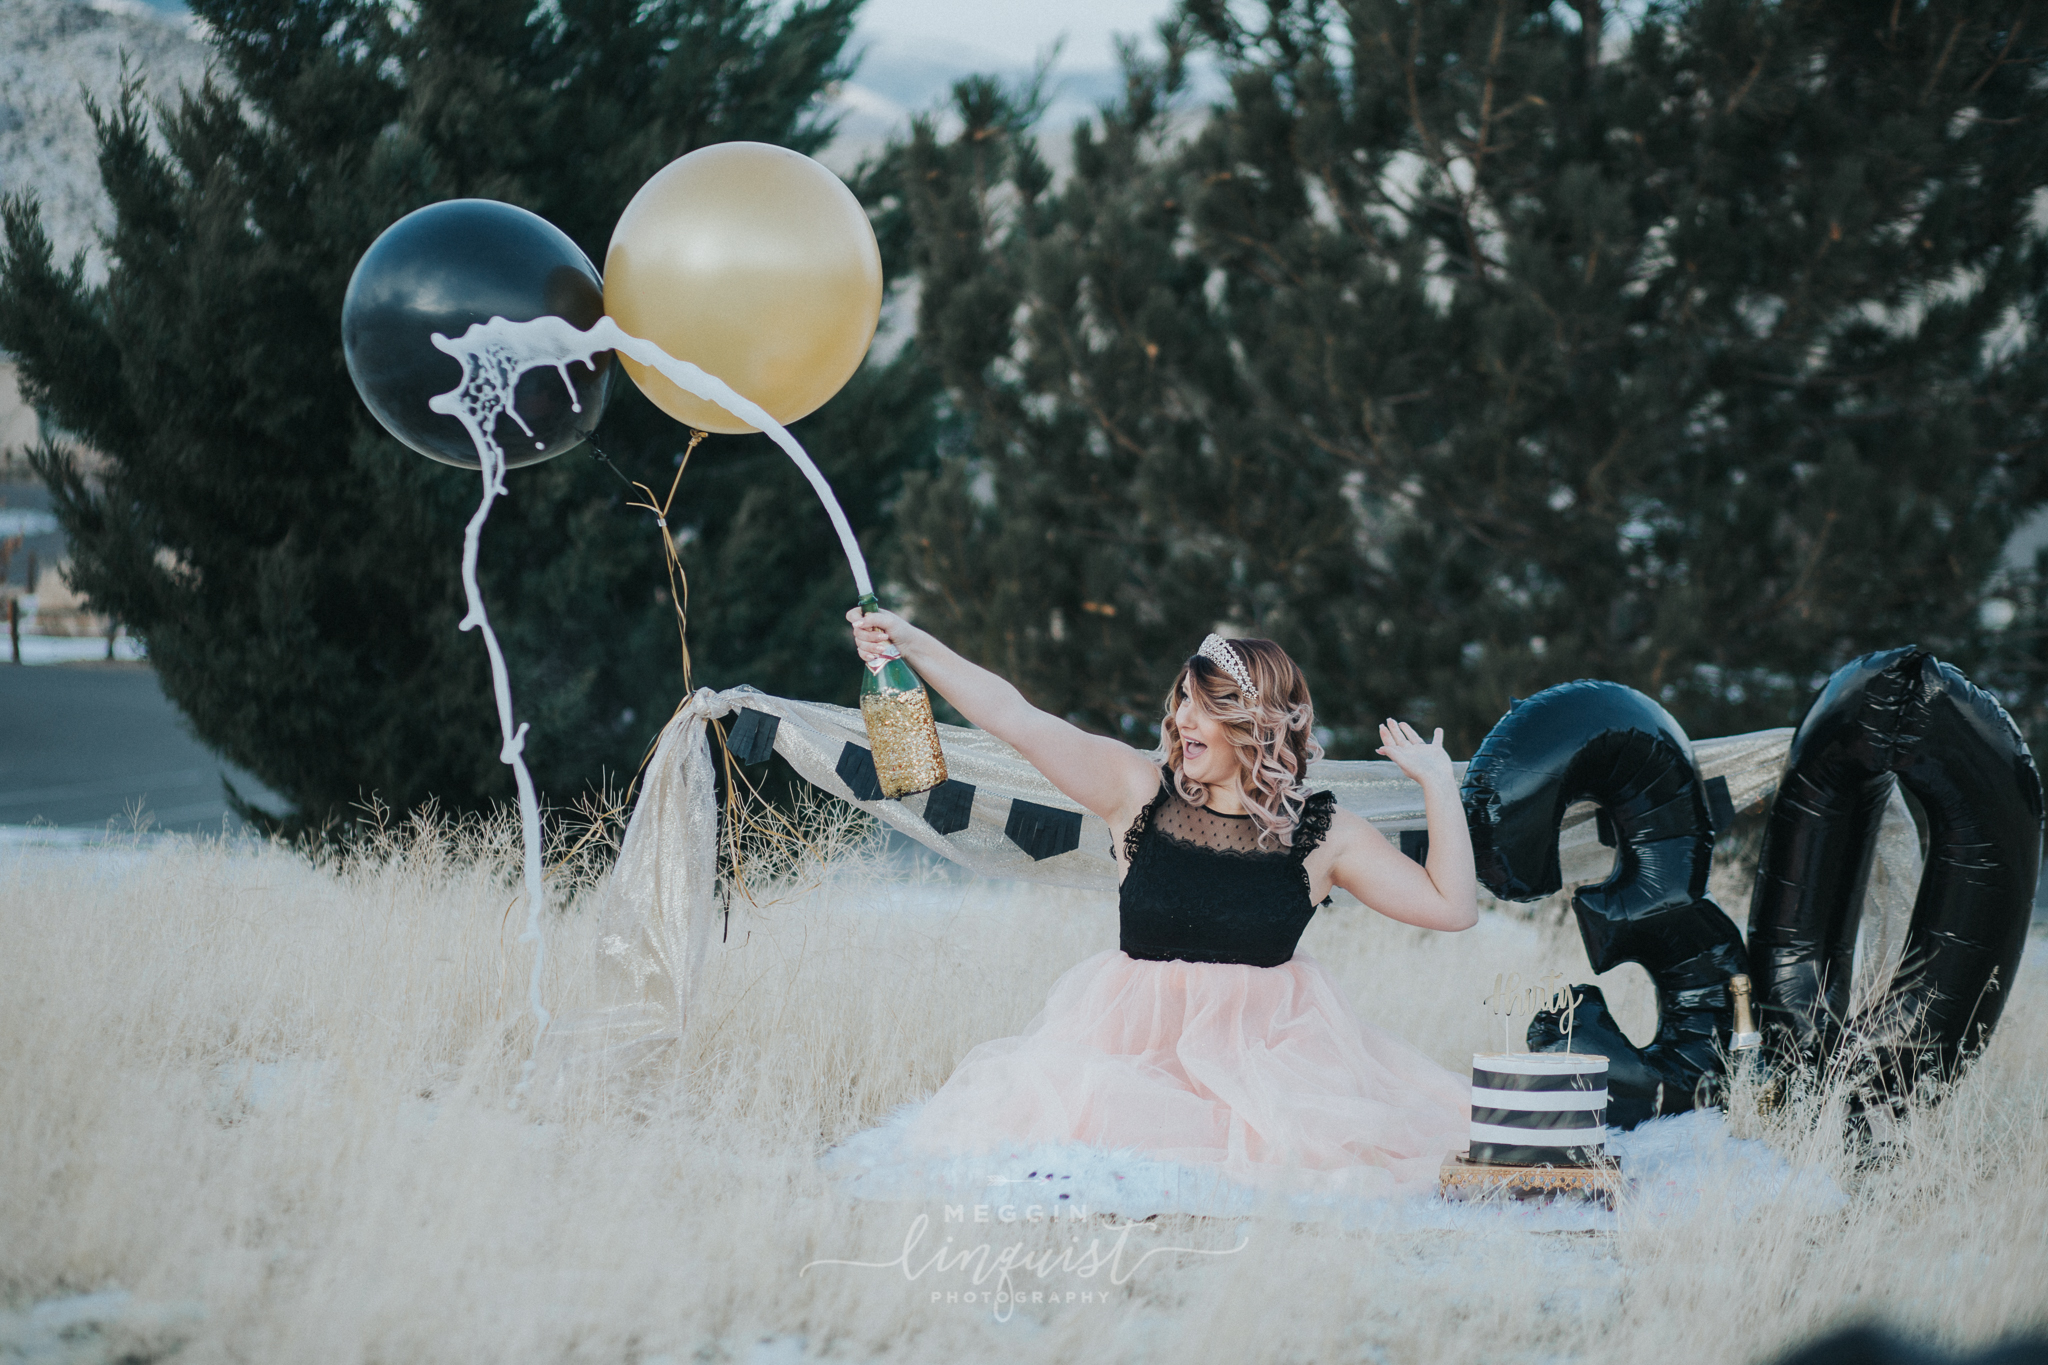 30th-birthday-cake-smash-reno-lake-tahoe-photographer-8.jpg